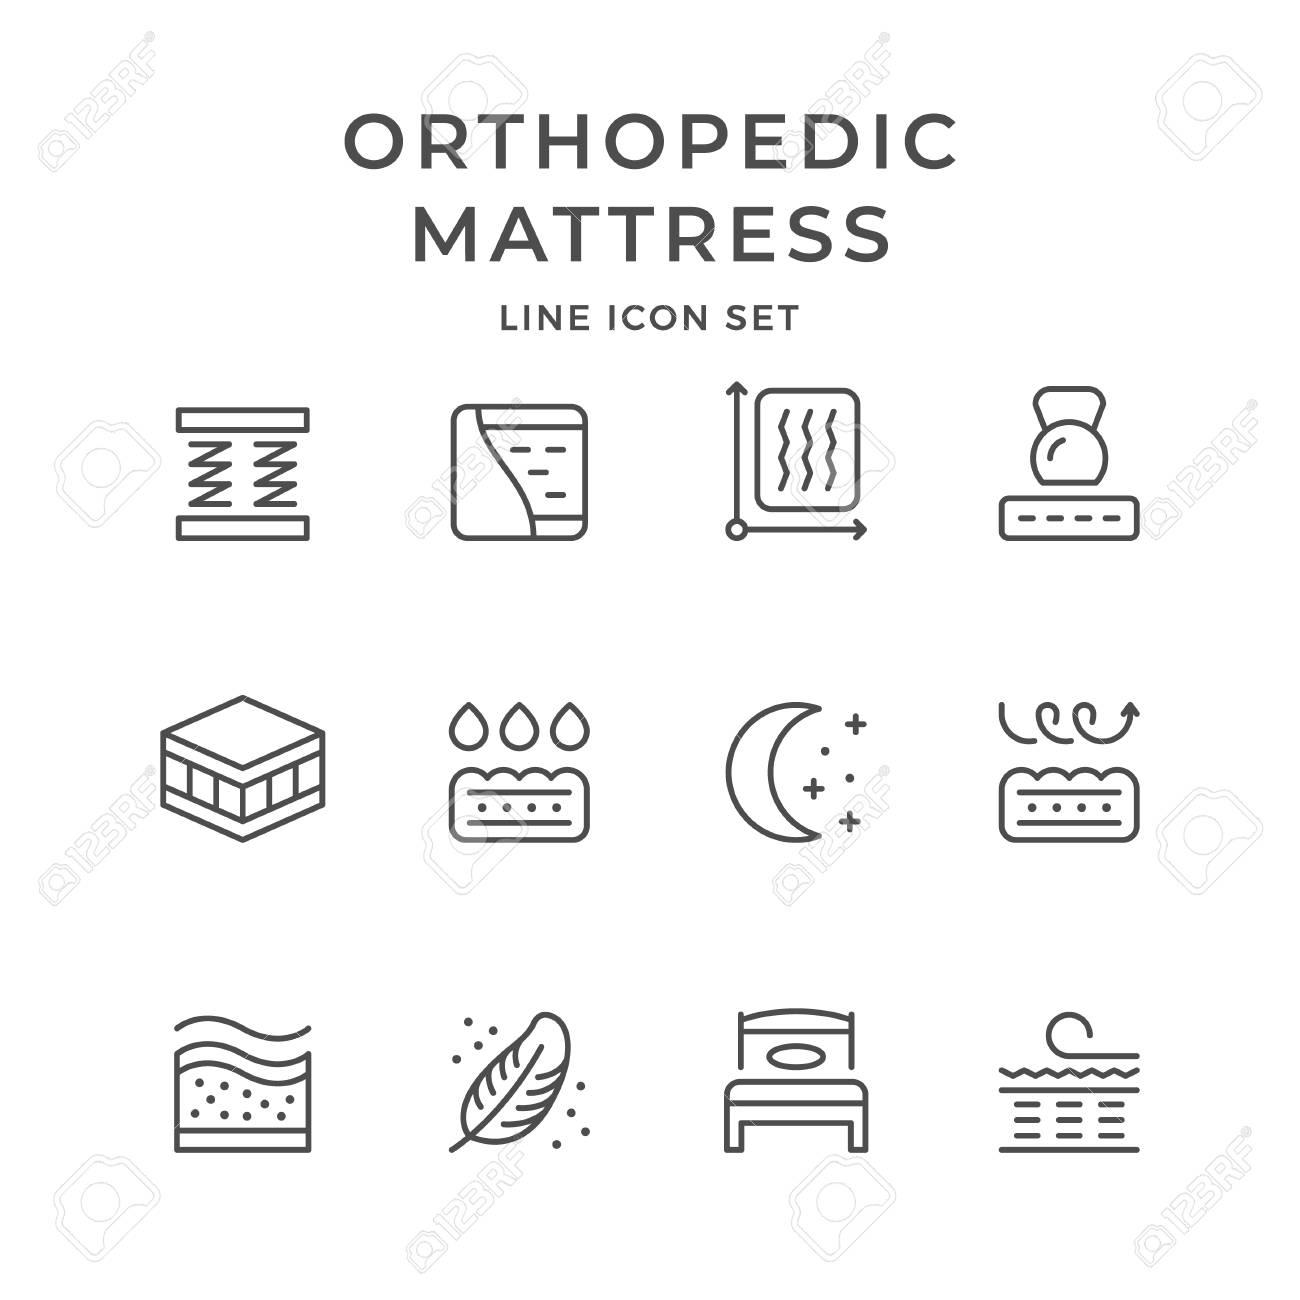 Set line icons of orthopedic mattress isolated on white. Vector illustration - 127413980